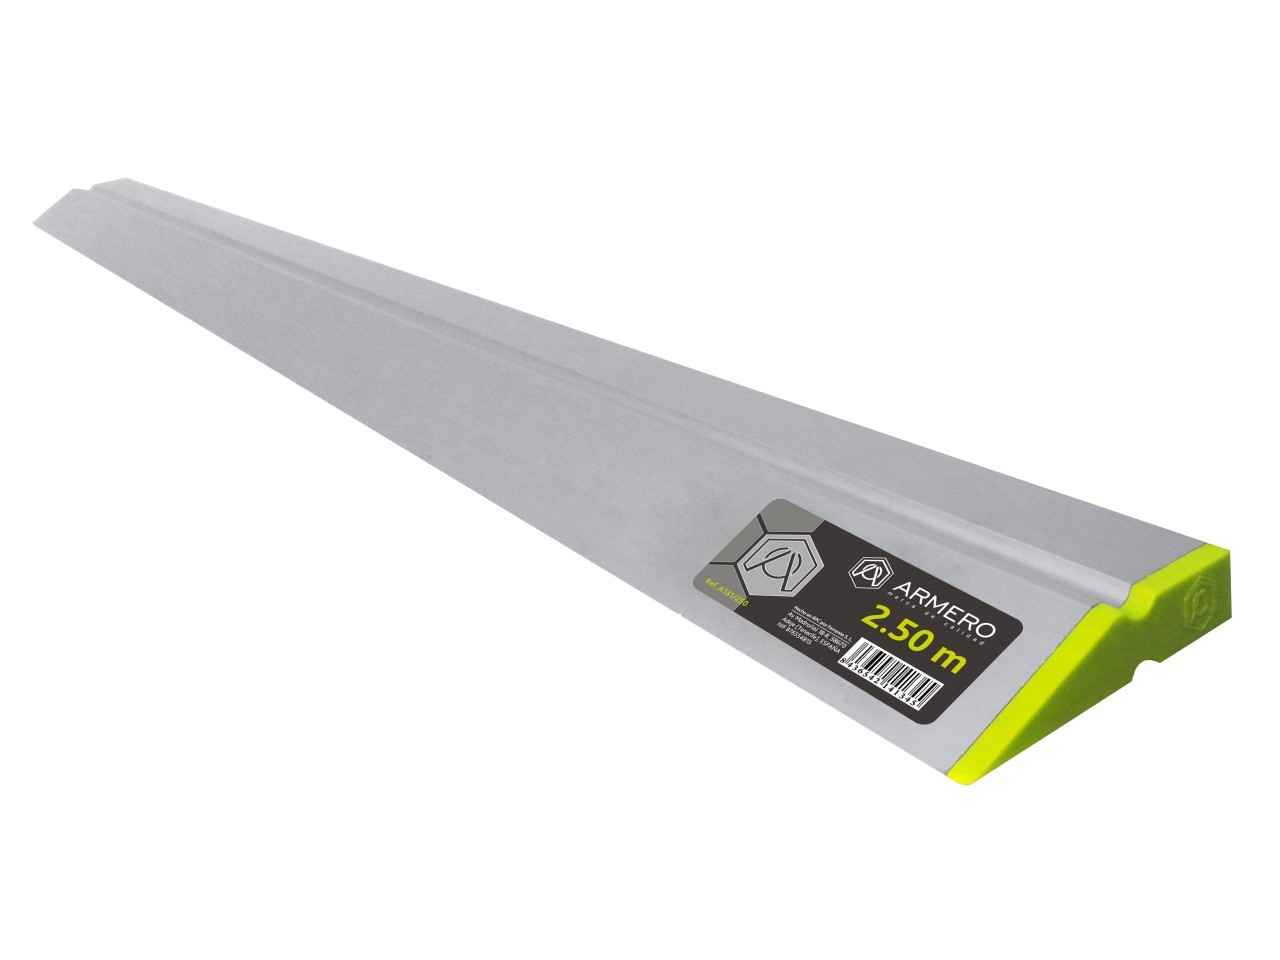 Правило алюминиевое A131/250, 2.5м